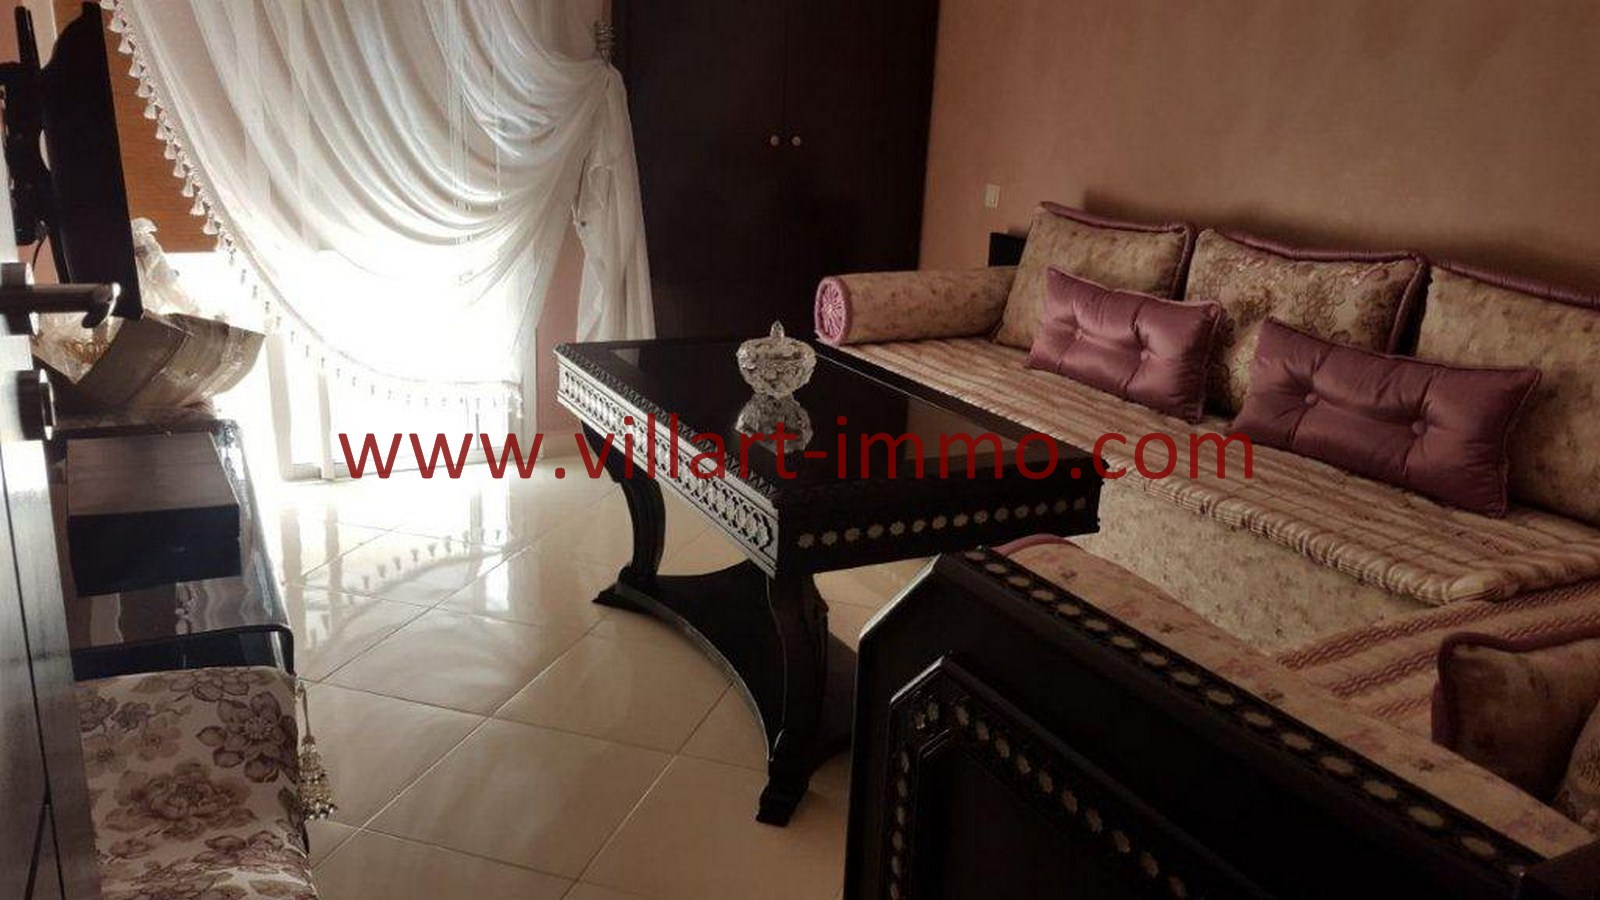 2-Vente-Appartement-Tanger-Salon 2-VA514-Route de Rabat-Villart Immo